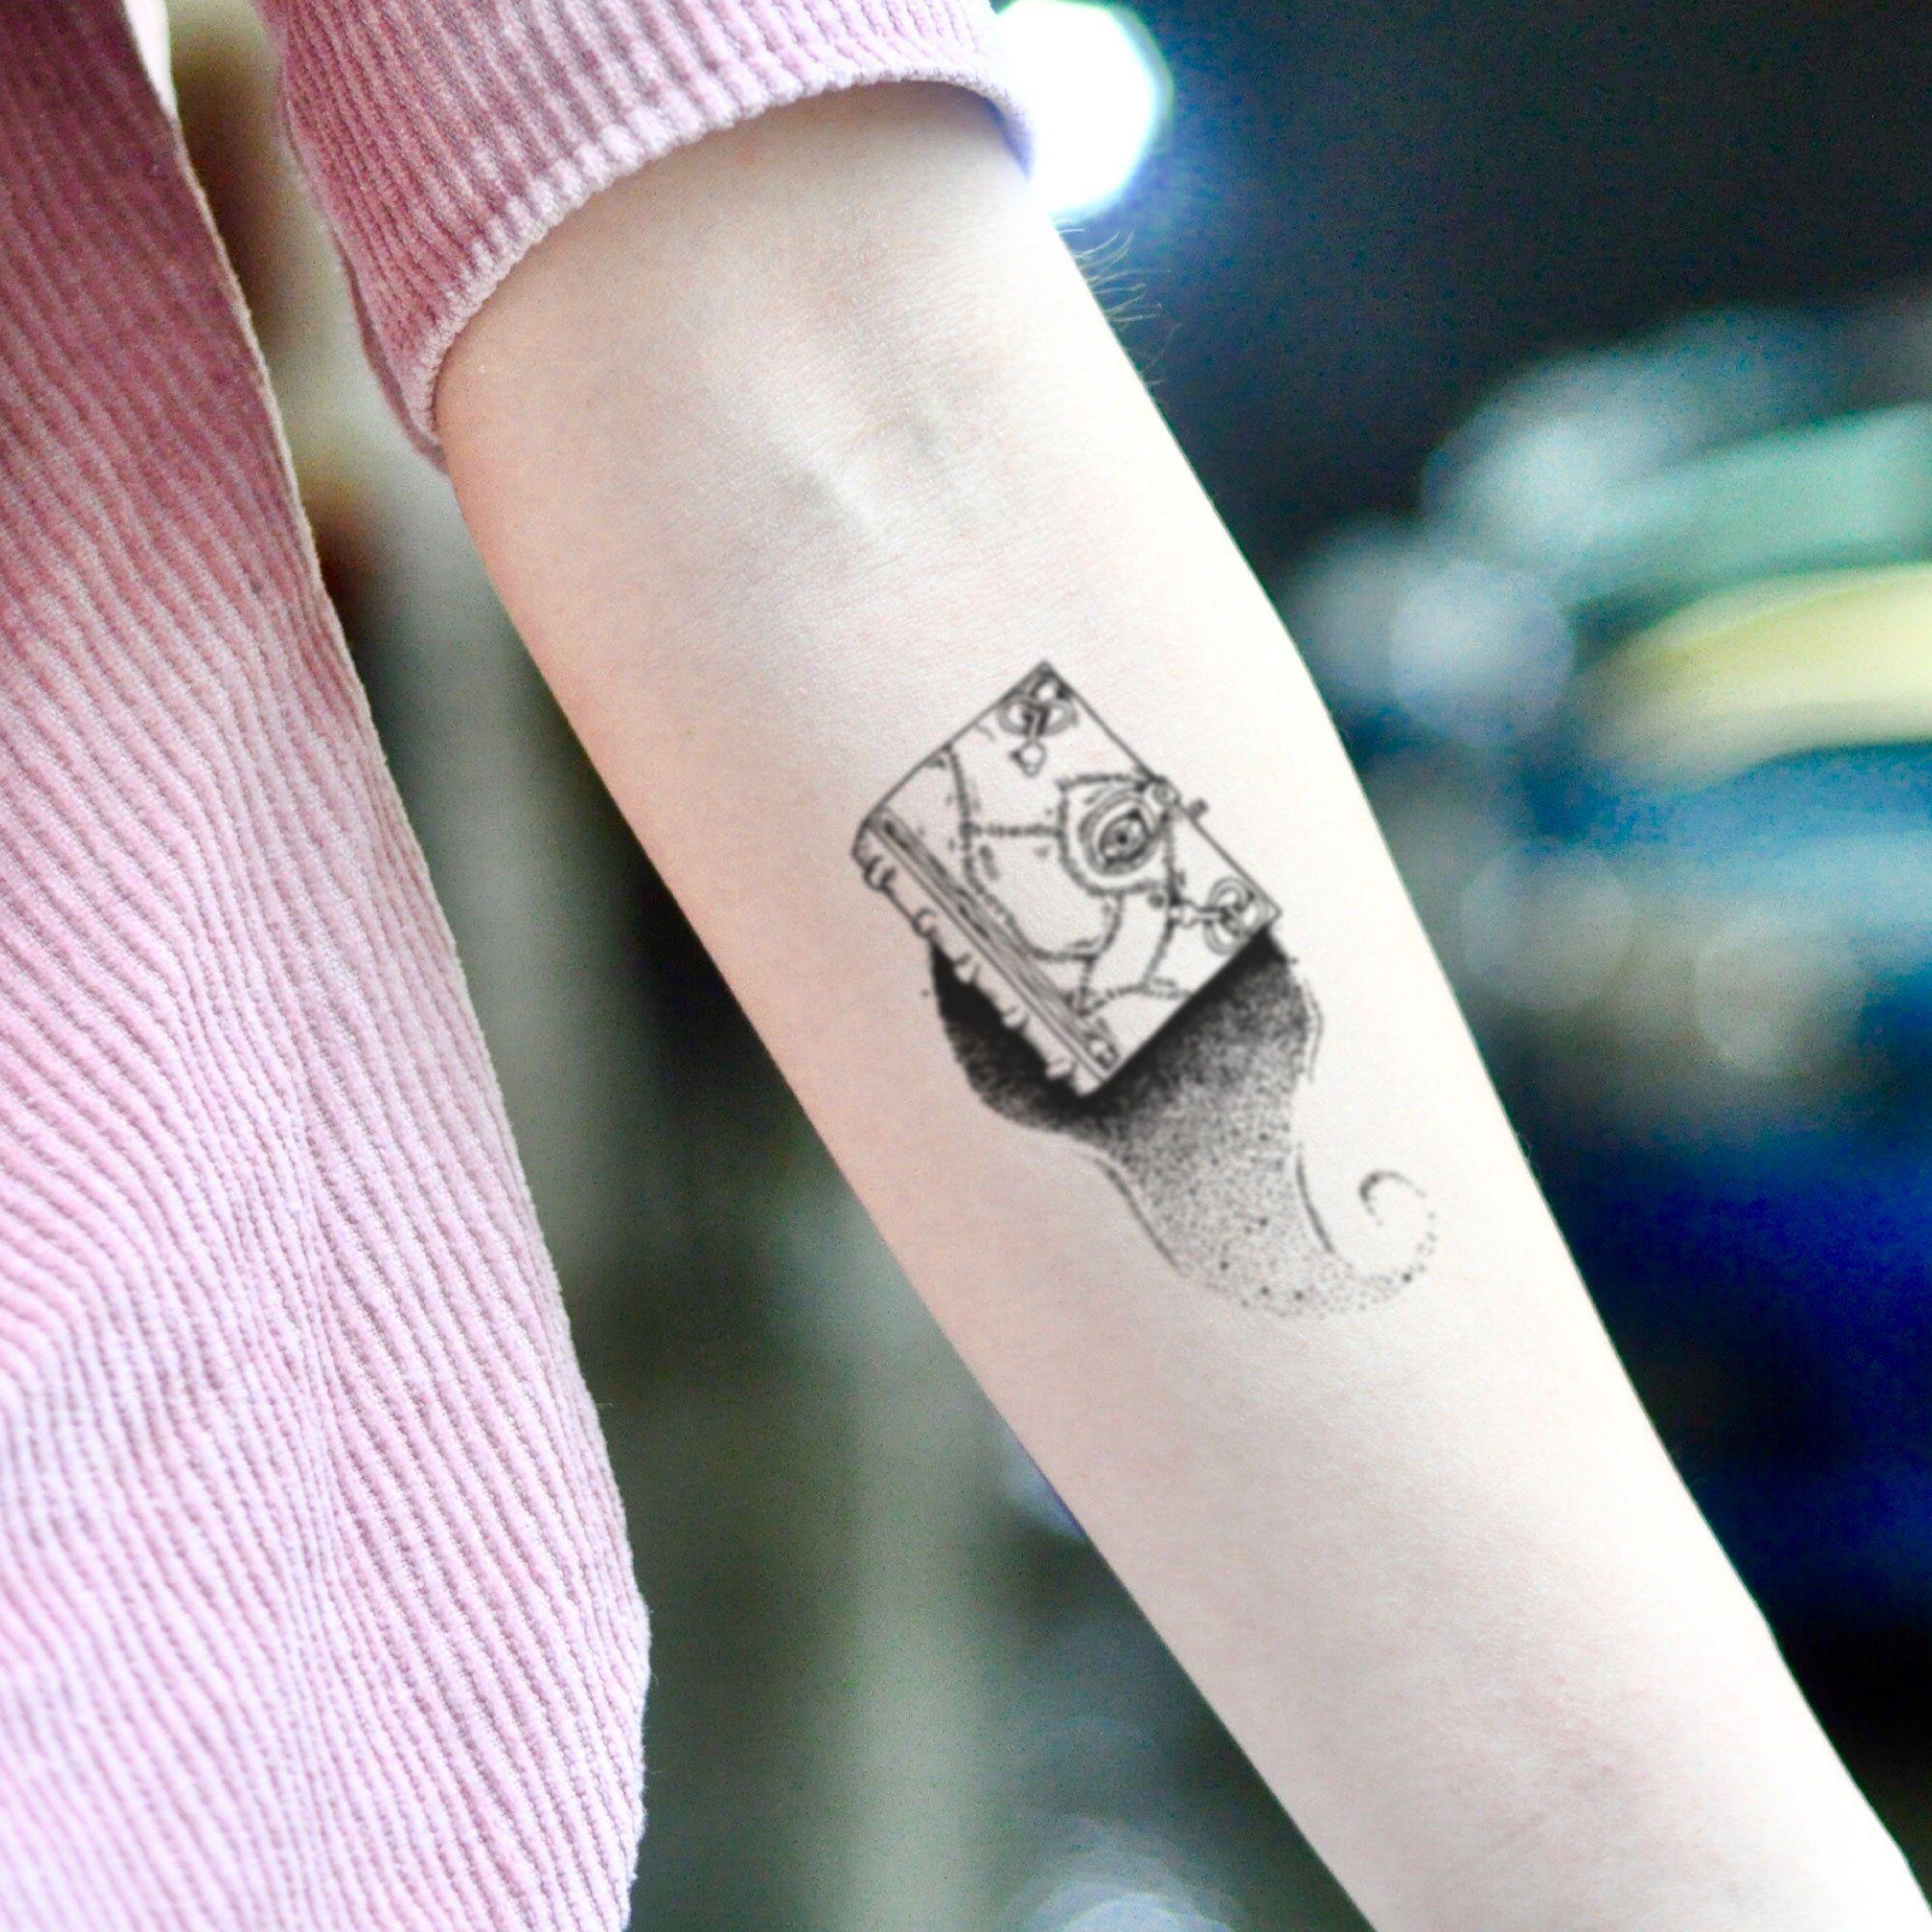 Hocus Pocus Spellbook Temporary Tattoo Sticker Set Of 2 Sleeve Tattoos Tattoo Stickers Tattoos